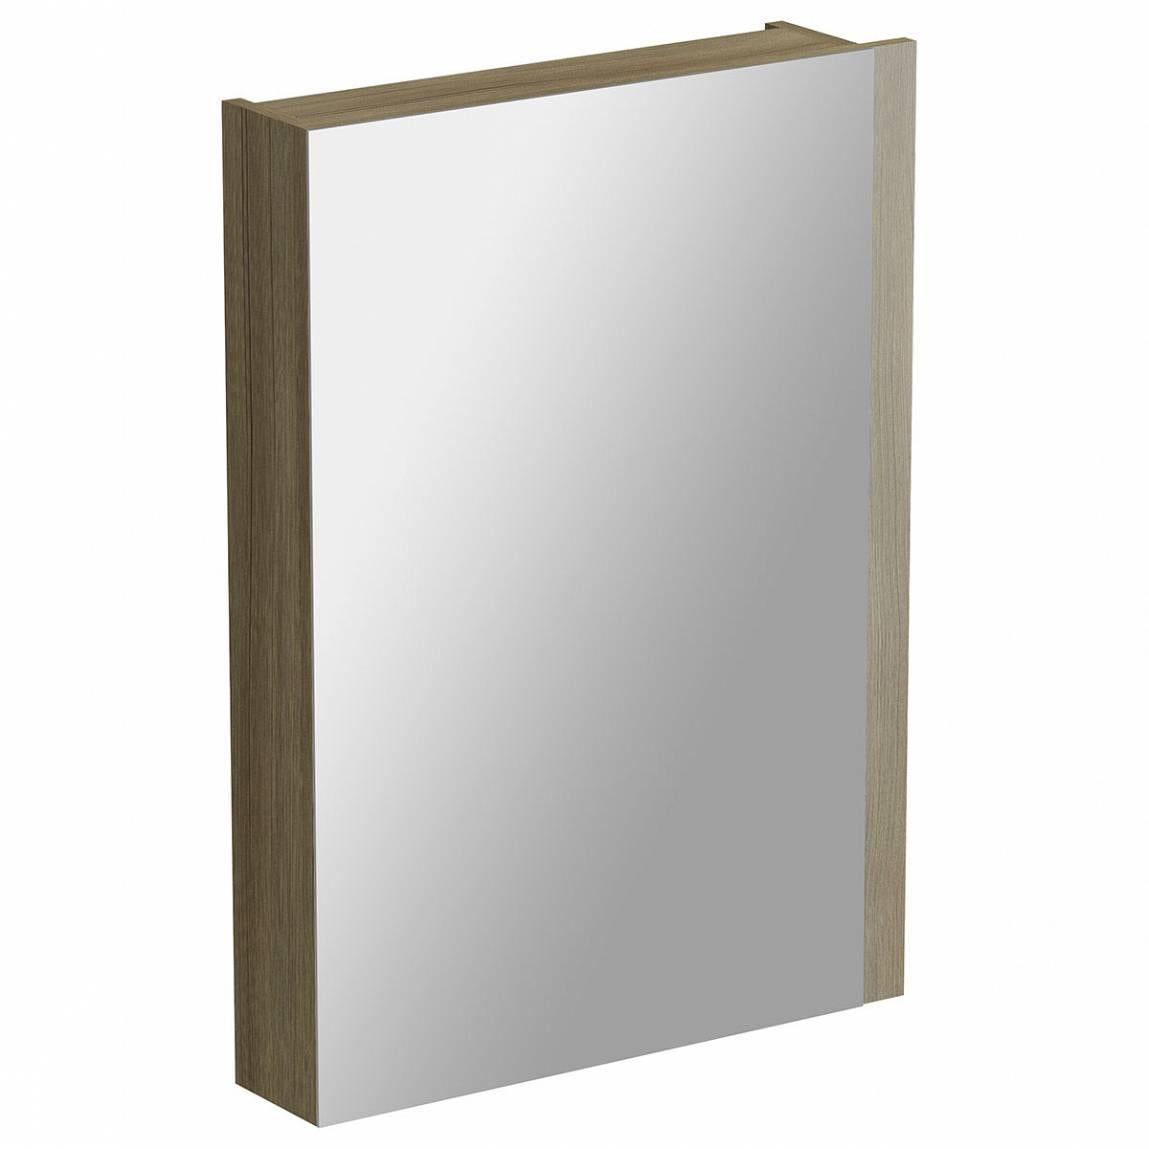 Drift Walnut Mirror Cabinet